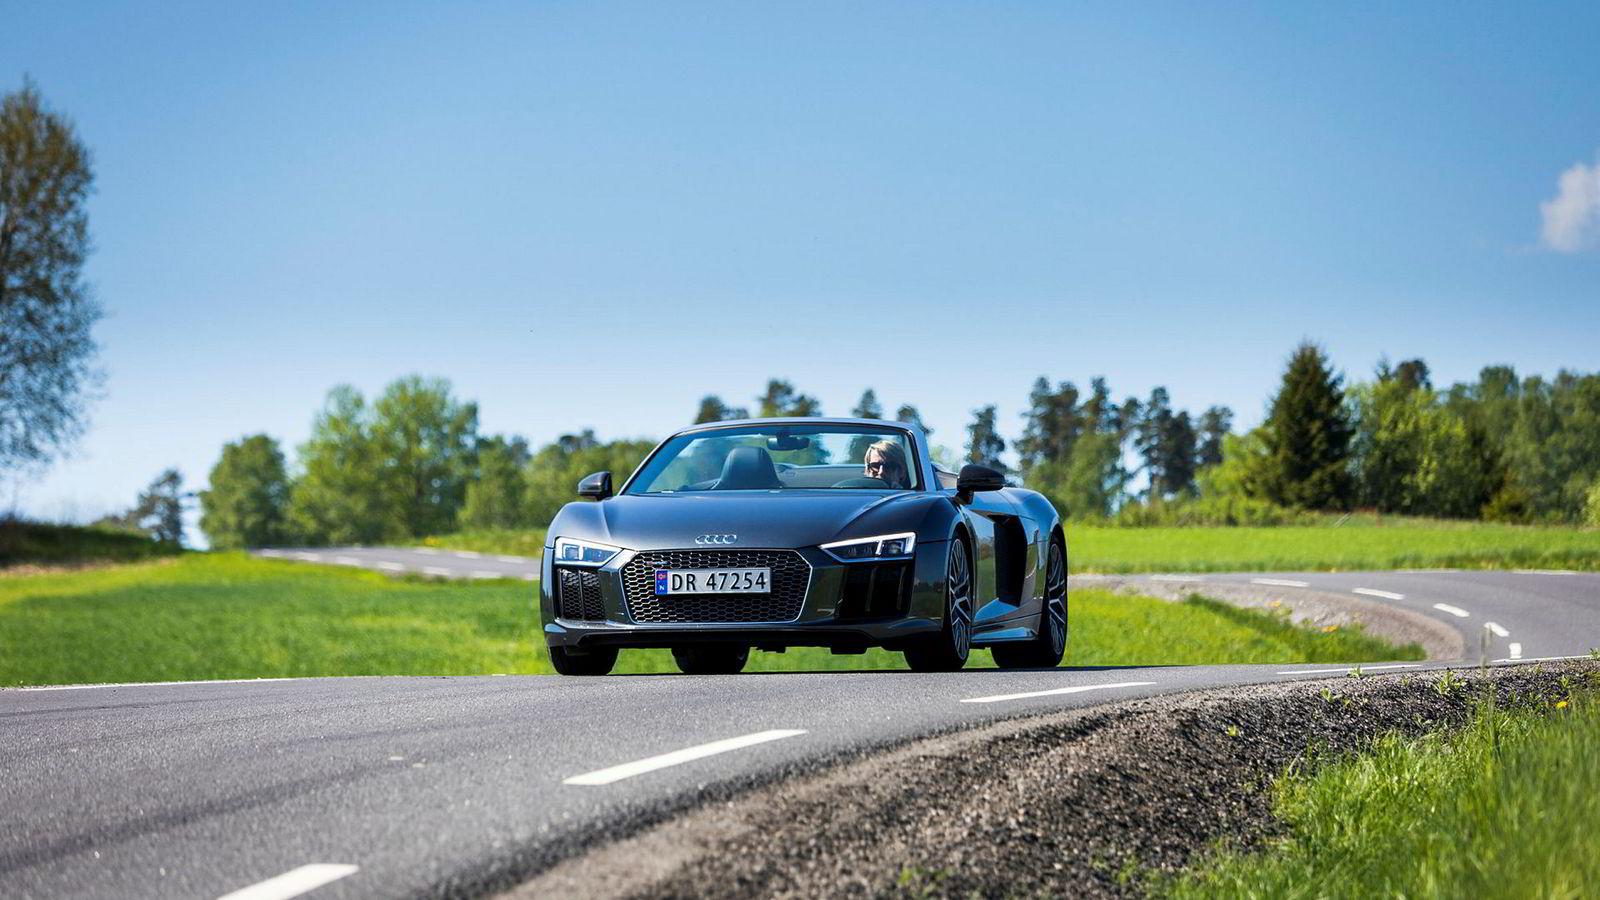 Superbil i supervær. Men været er ingen showstopper uansett i Audi R8 Spyder V10 Plus.